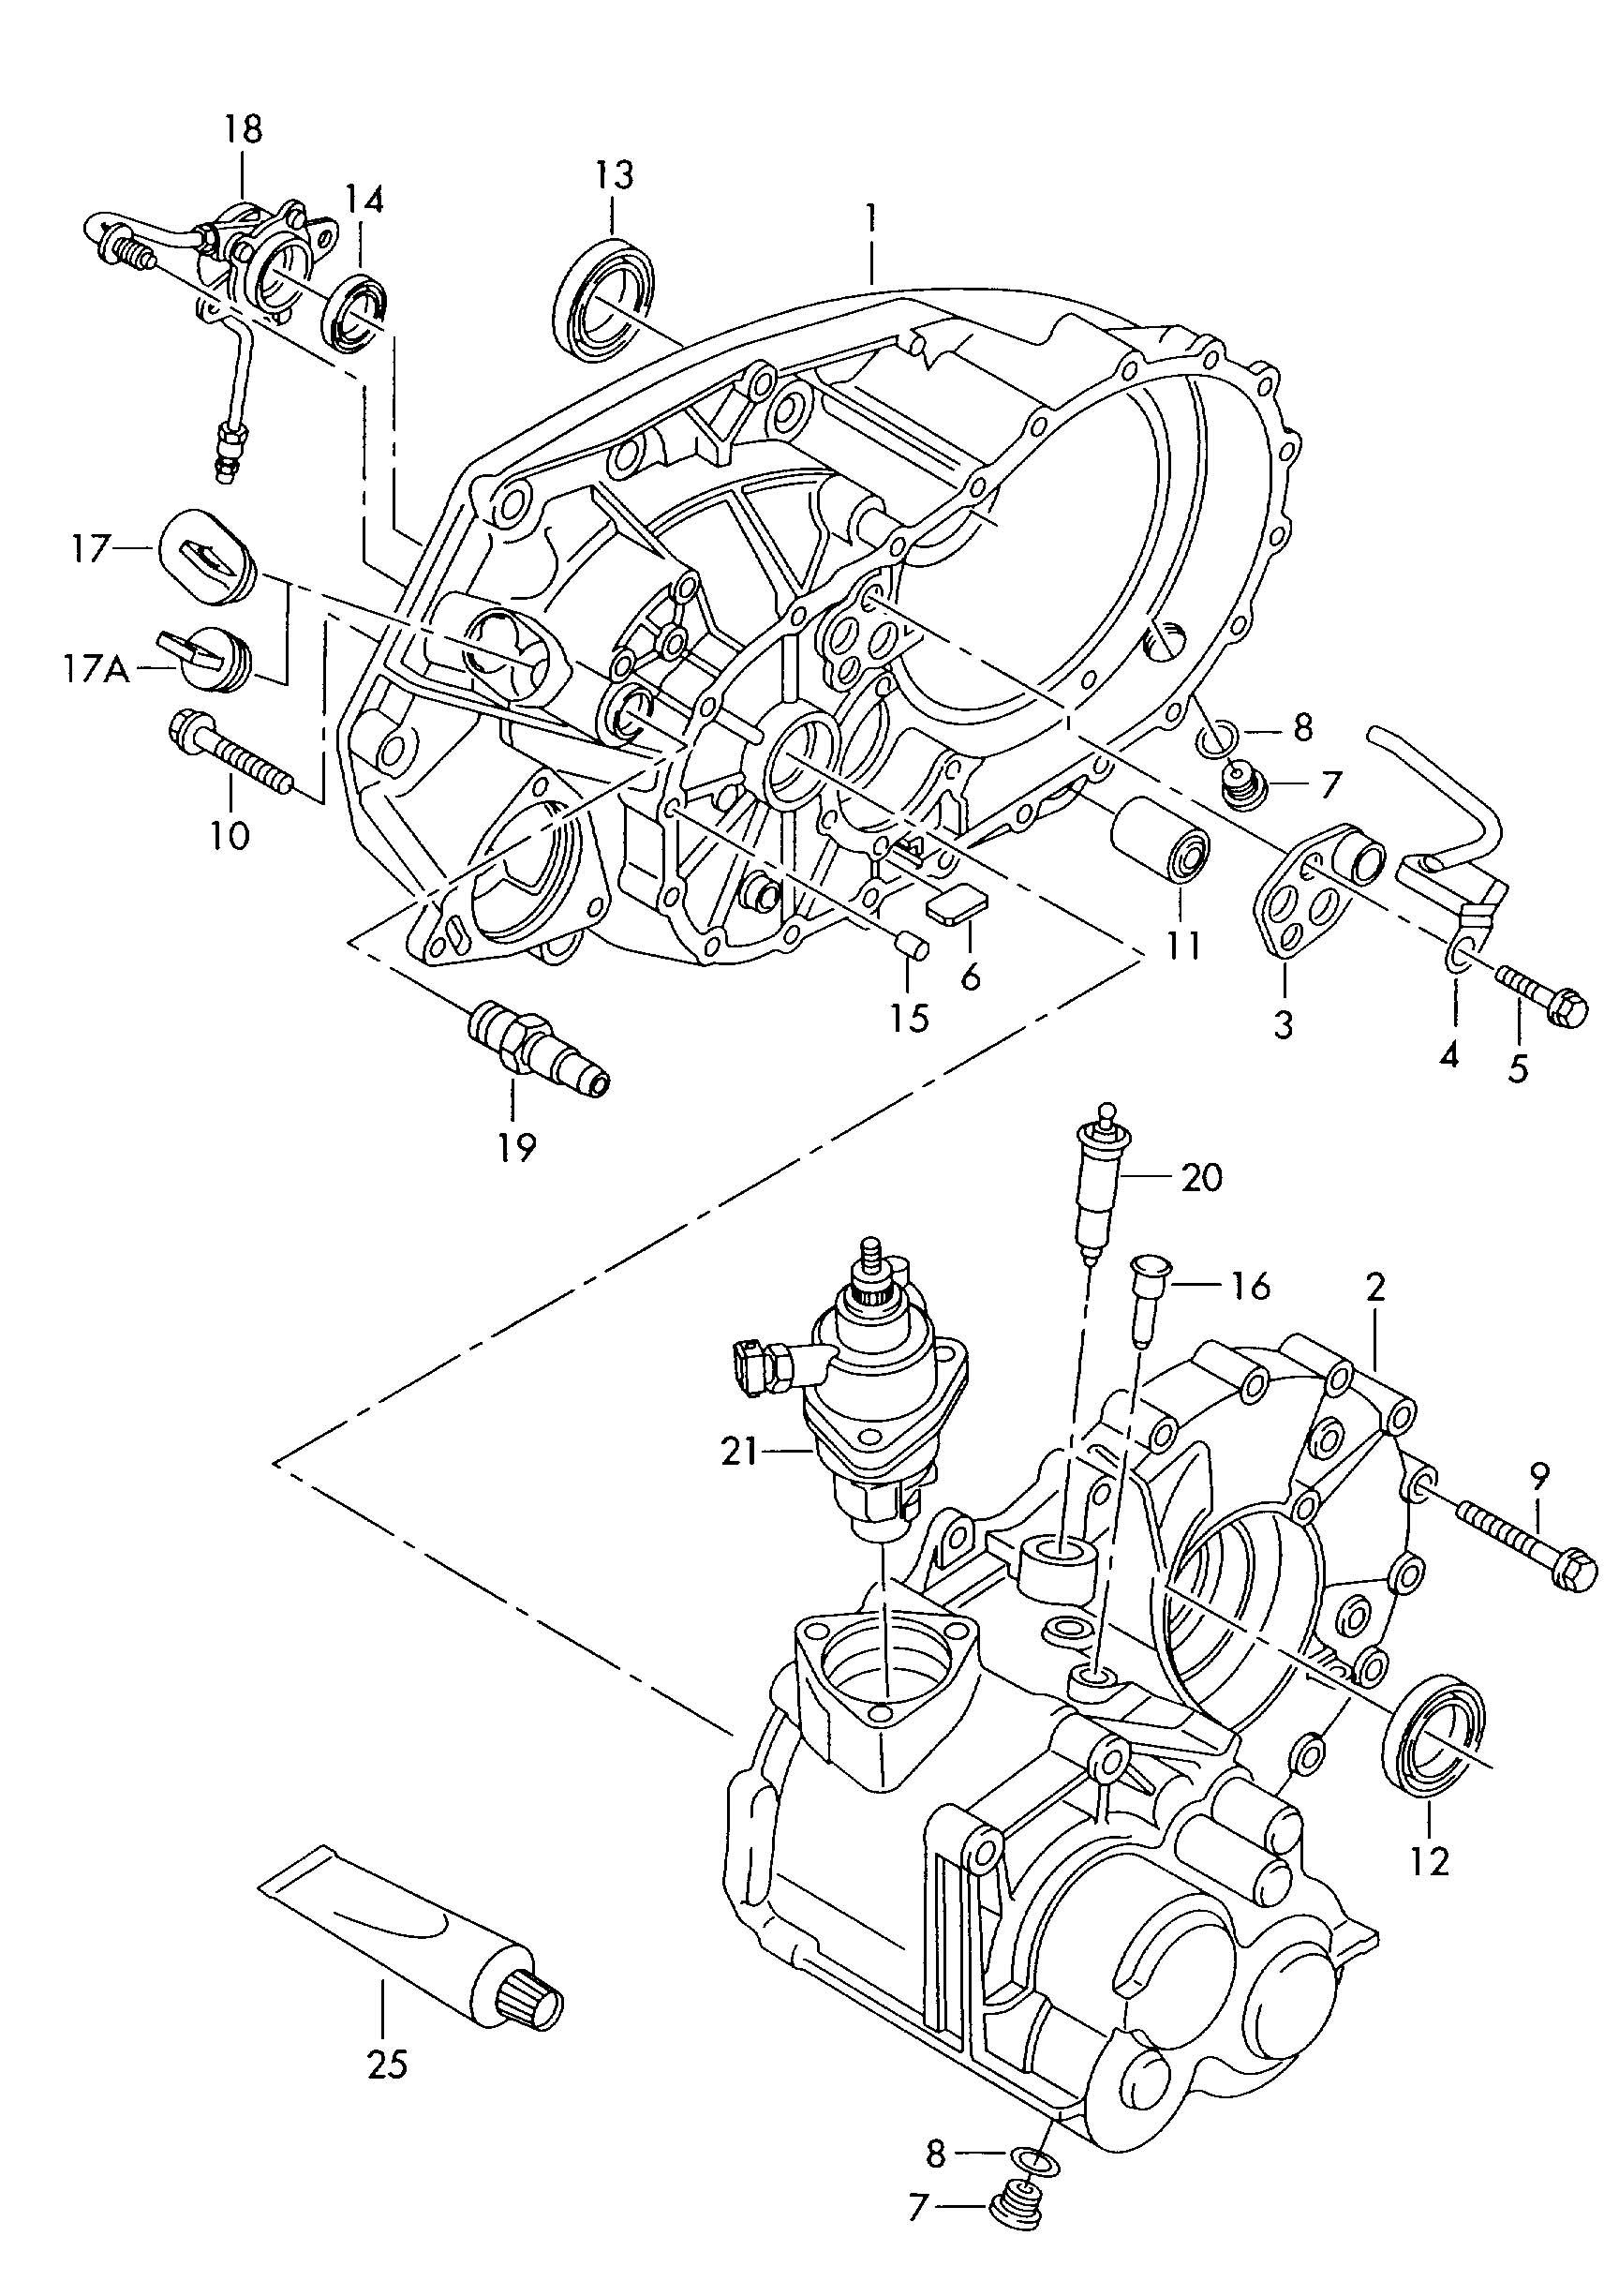 Volkswagen EuroVan Valve unit pressure hose. ILLUSTRATION